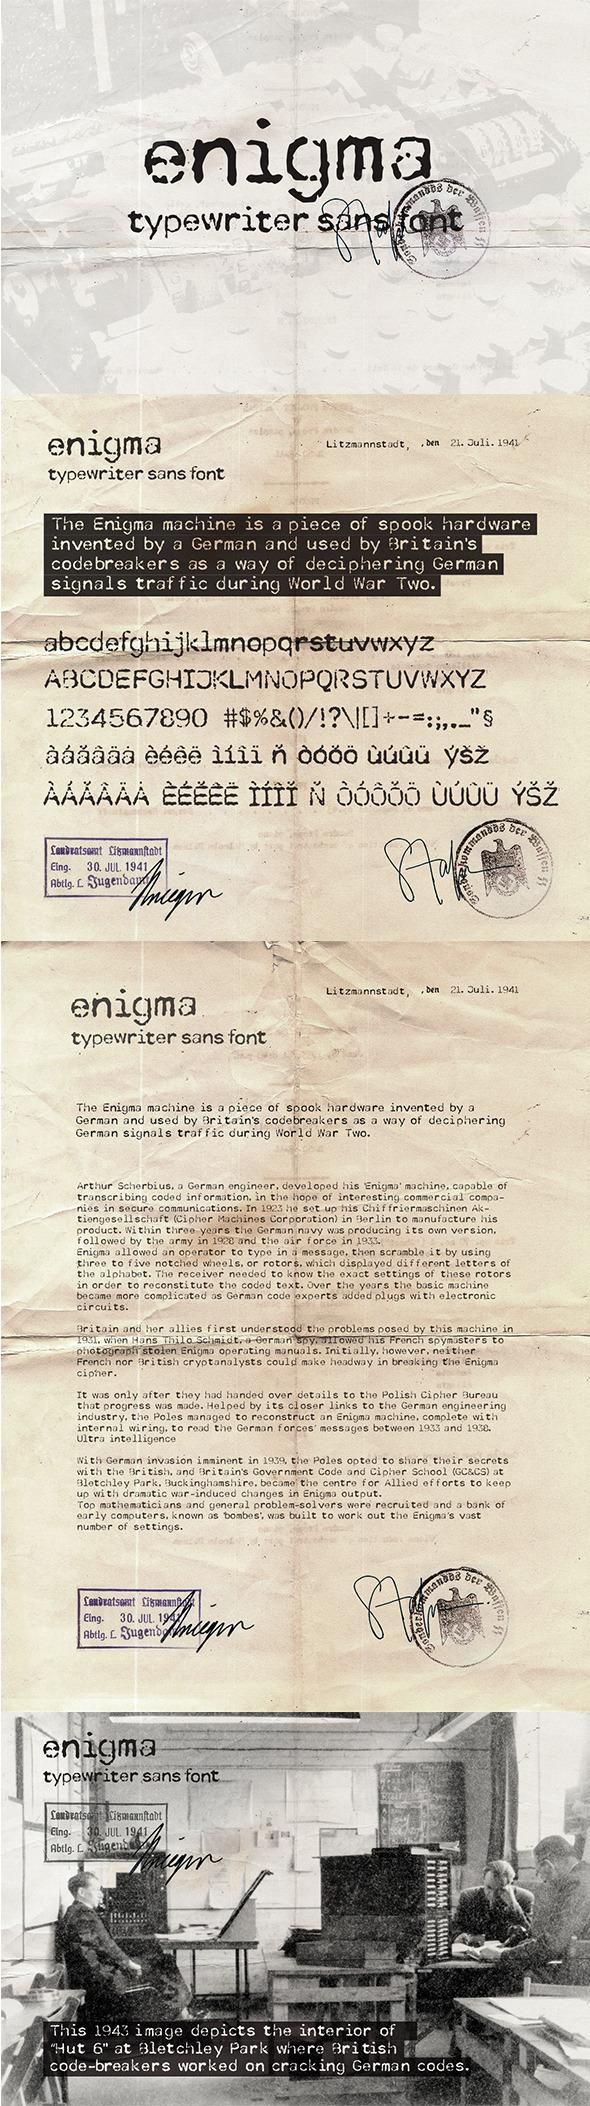 Enigma Typewriter Sans Font - Serif Fonts